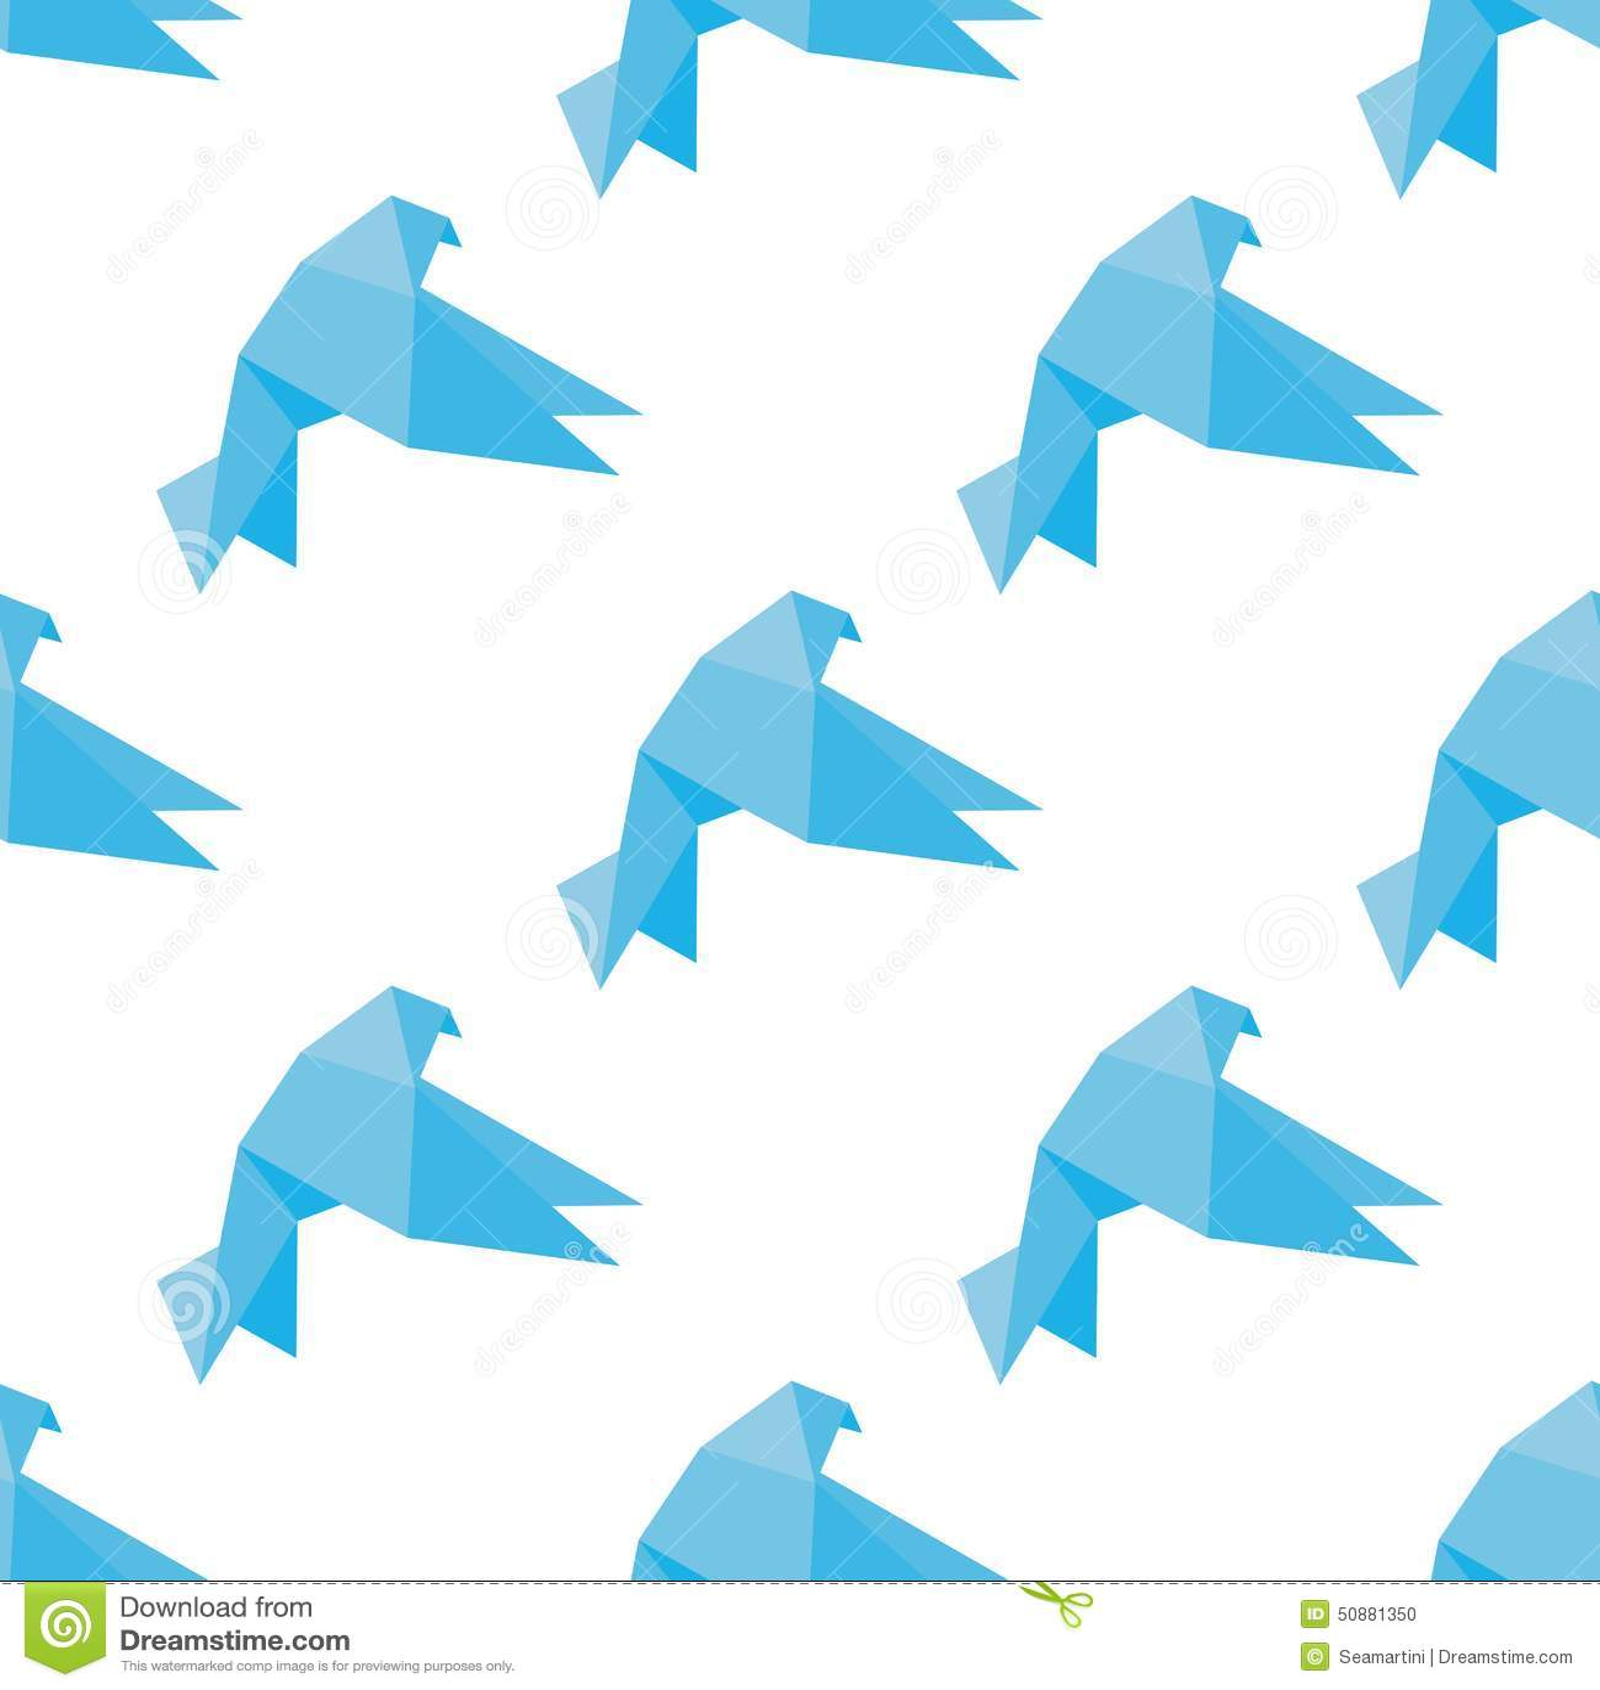 how to make white paper doves